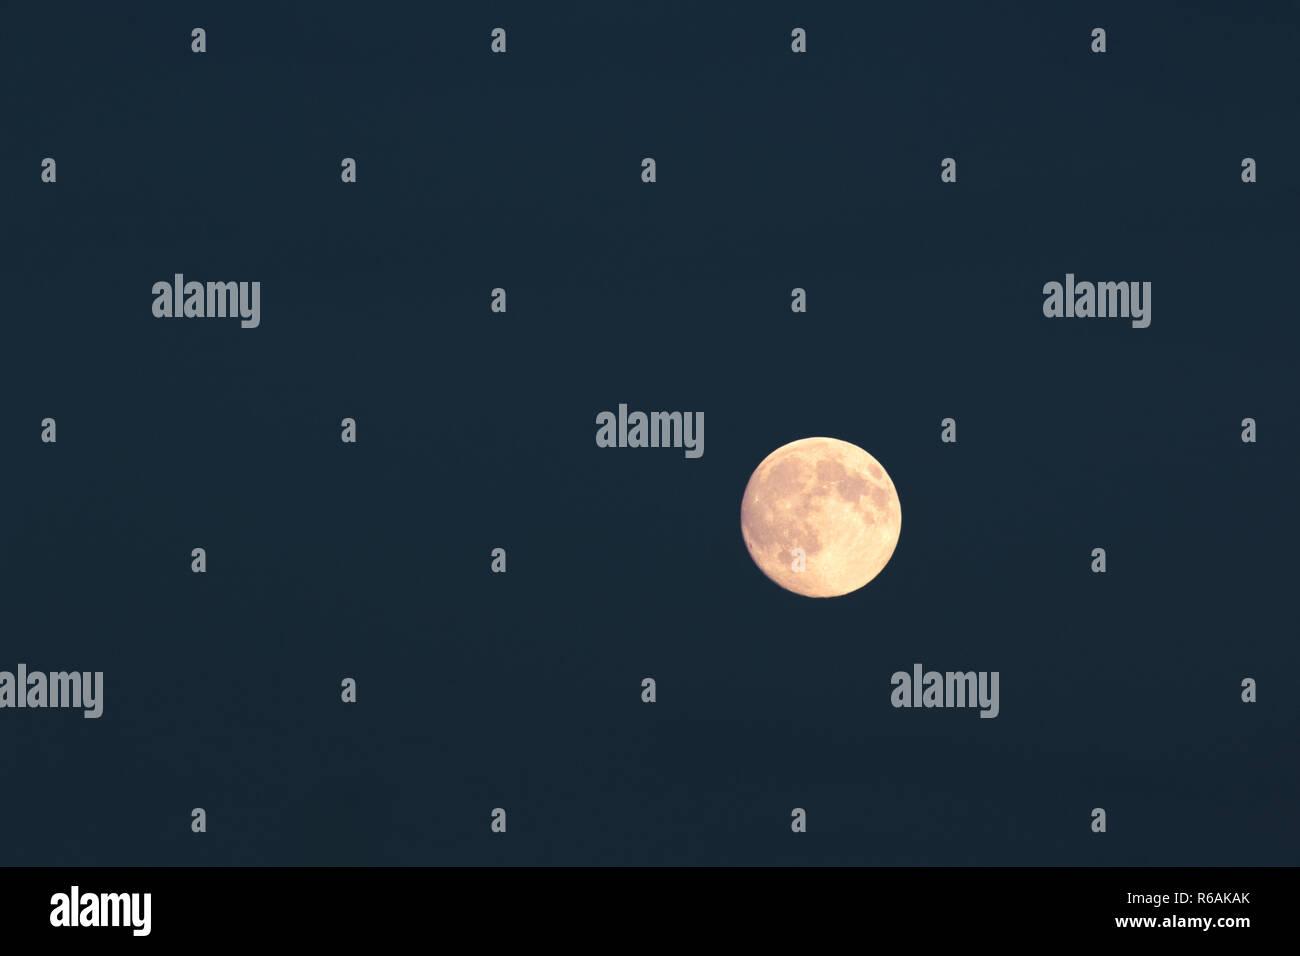 Full Moon Over Dark Blue Night Sky - Stock Image